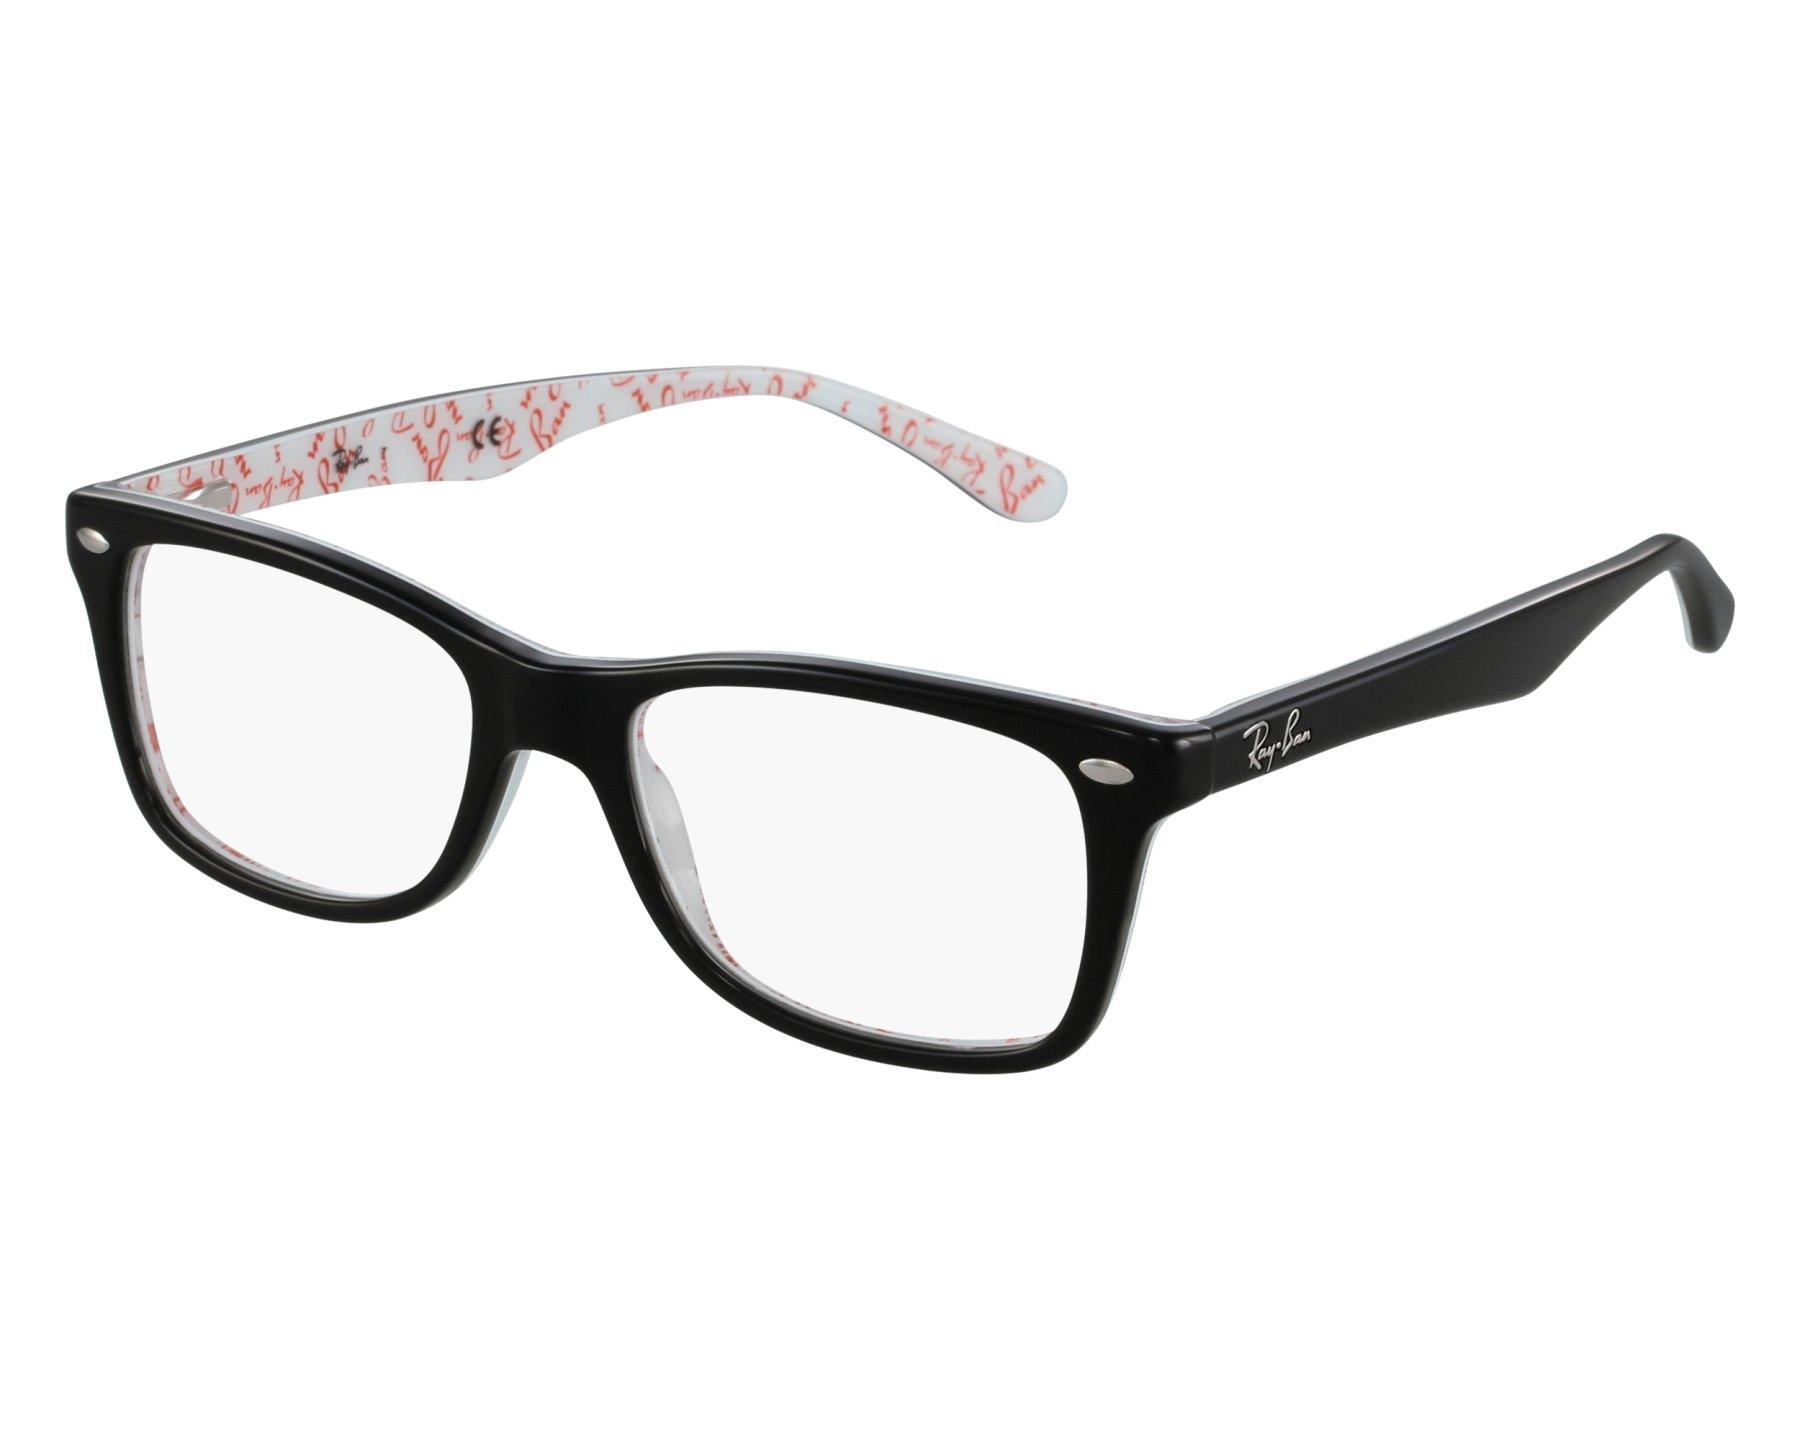 orig ray ban brille brillengestell rx 5228 5014 neu. Black Bedroom Furniture Sets. Home Design Ideas